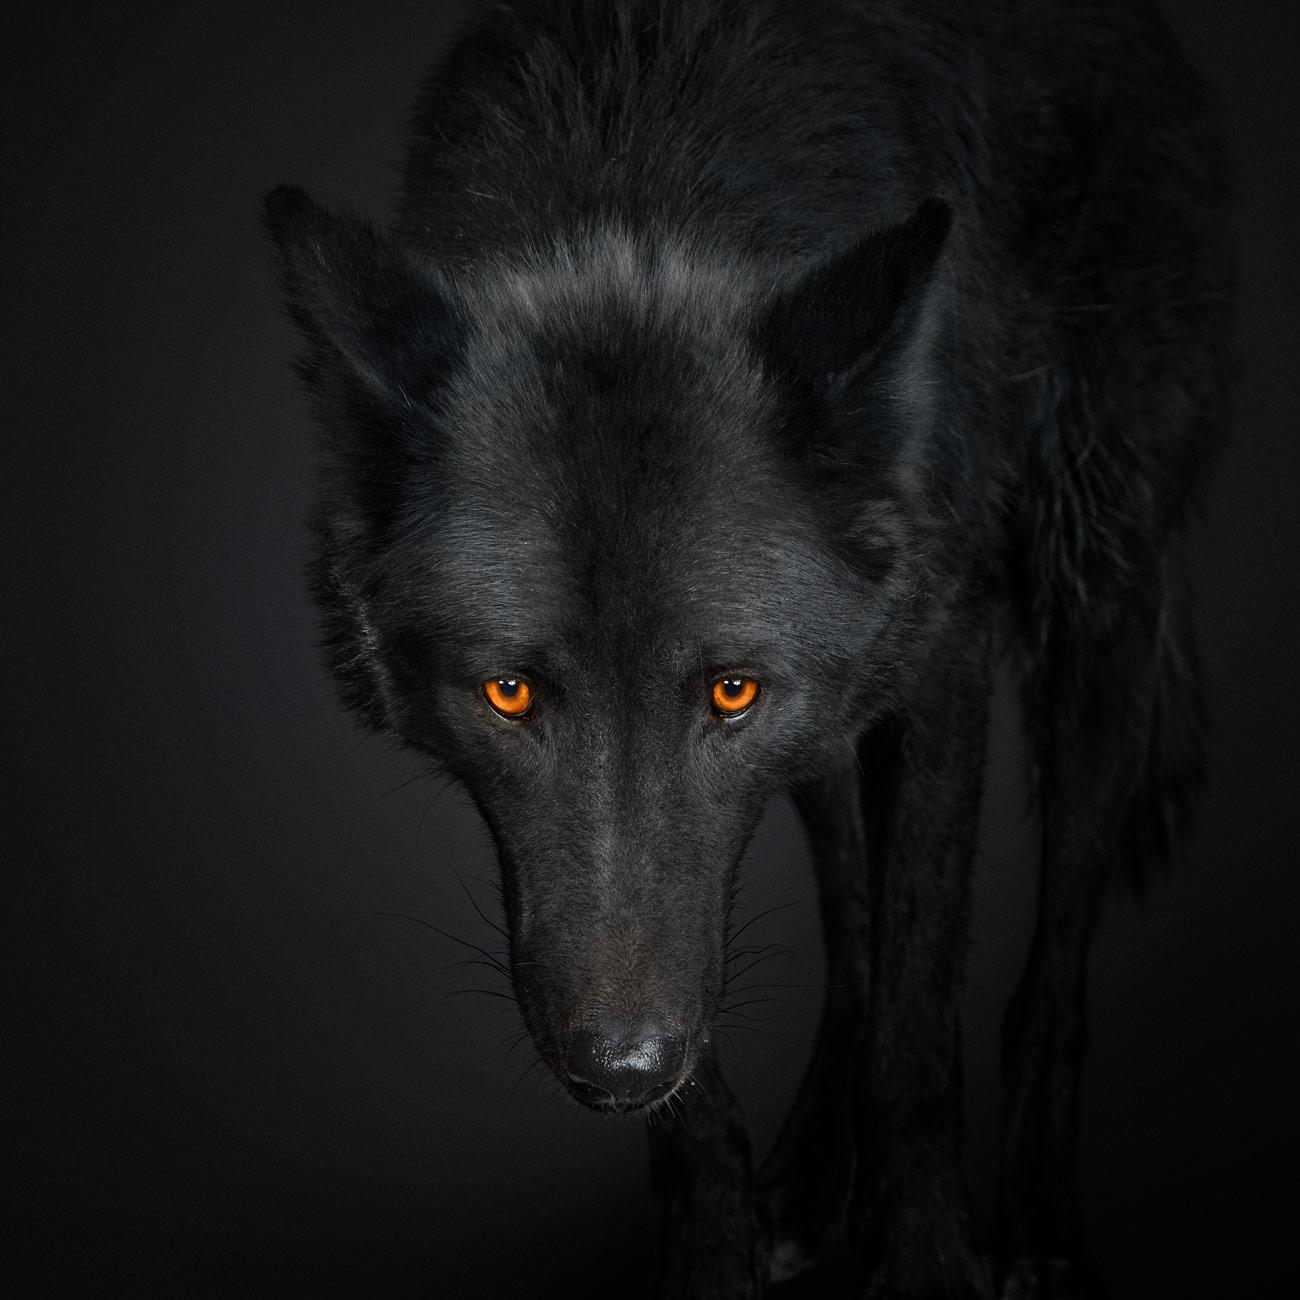 black wolf no 1 randal ford randal ford